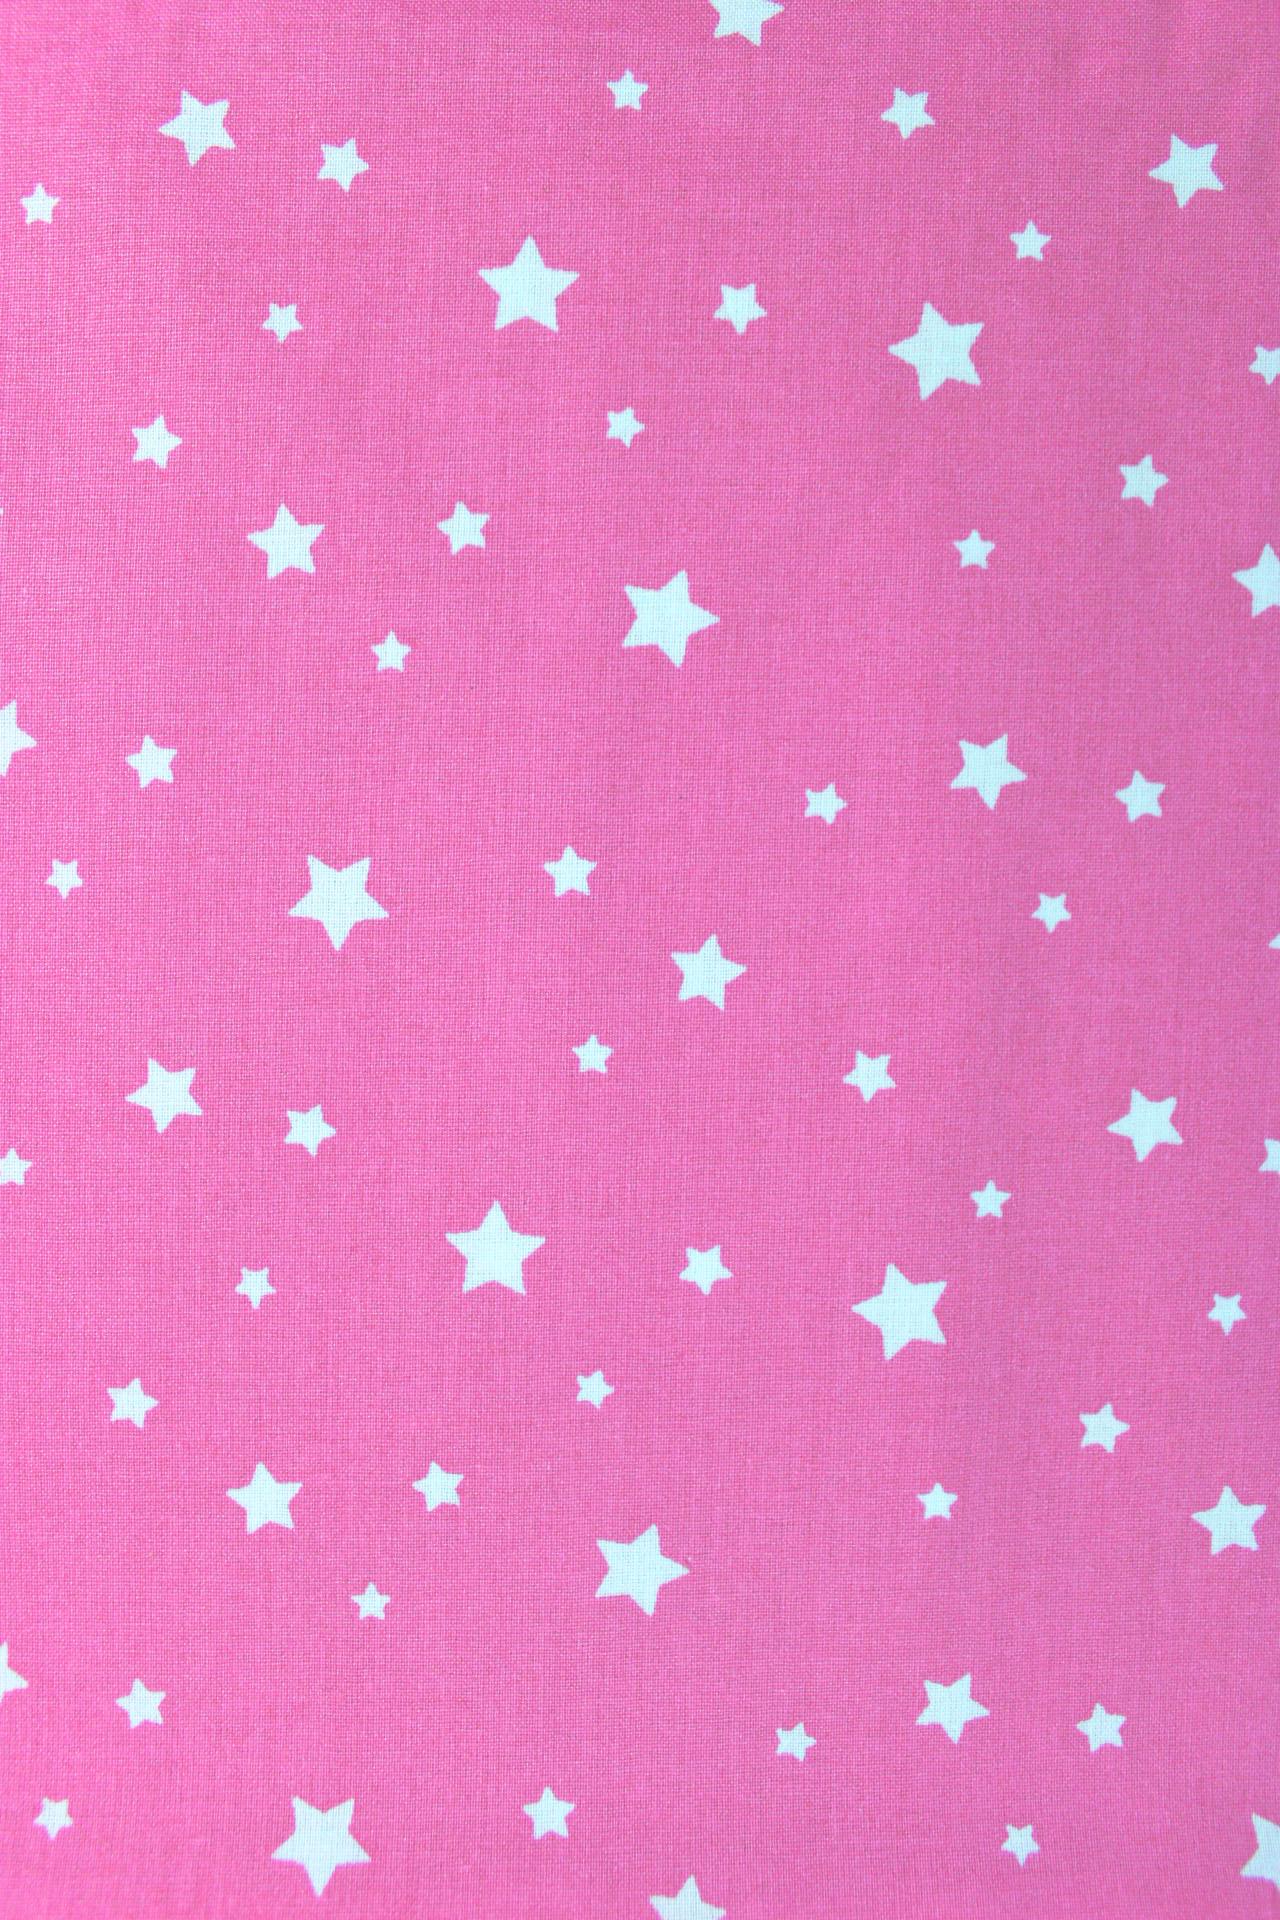 Bavlna hviezdičková ružová - Látky Magnólia 0ec8ce830e